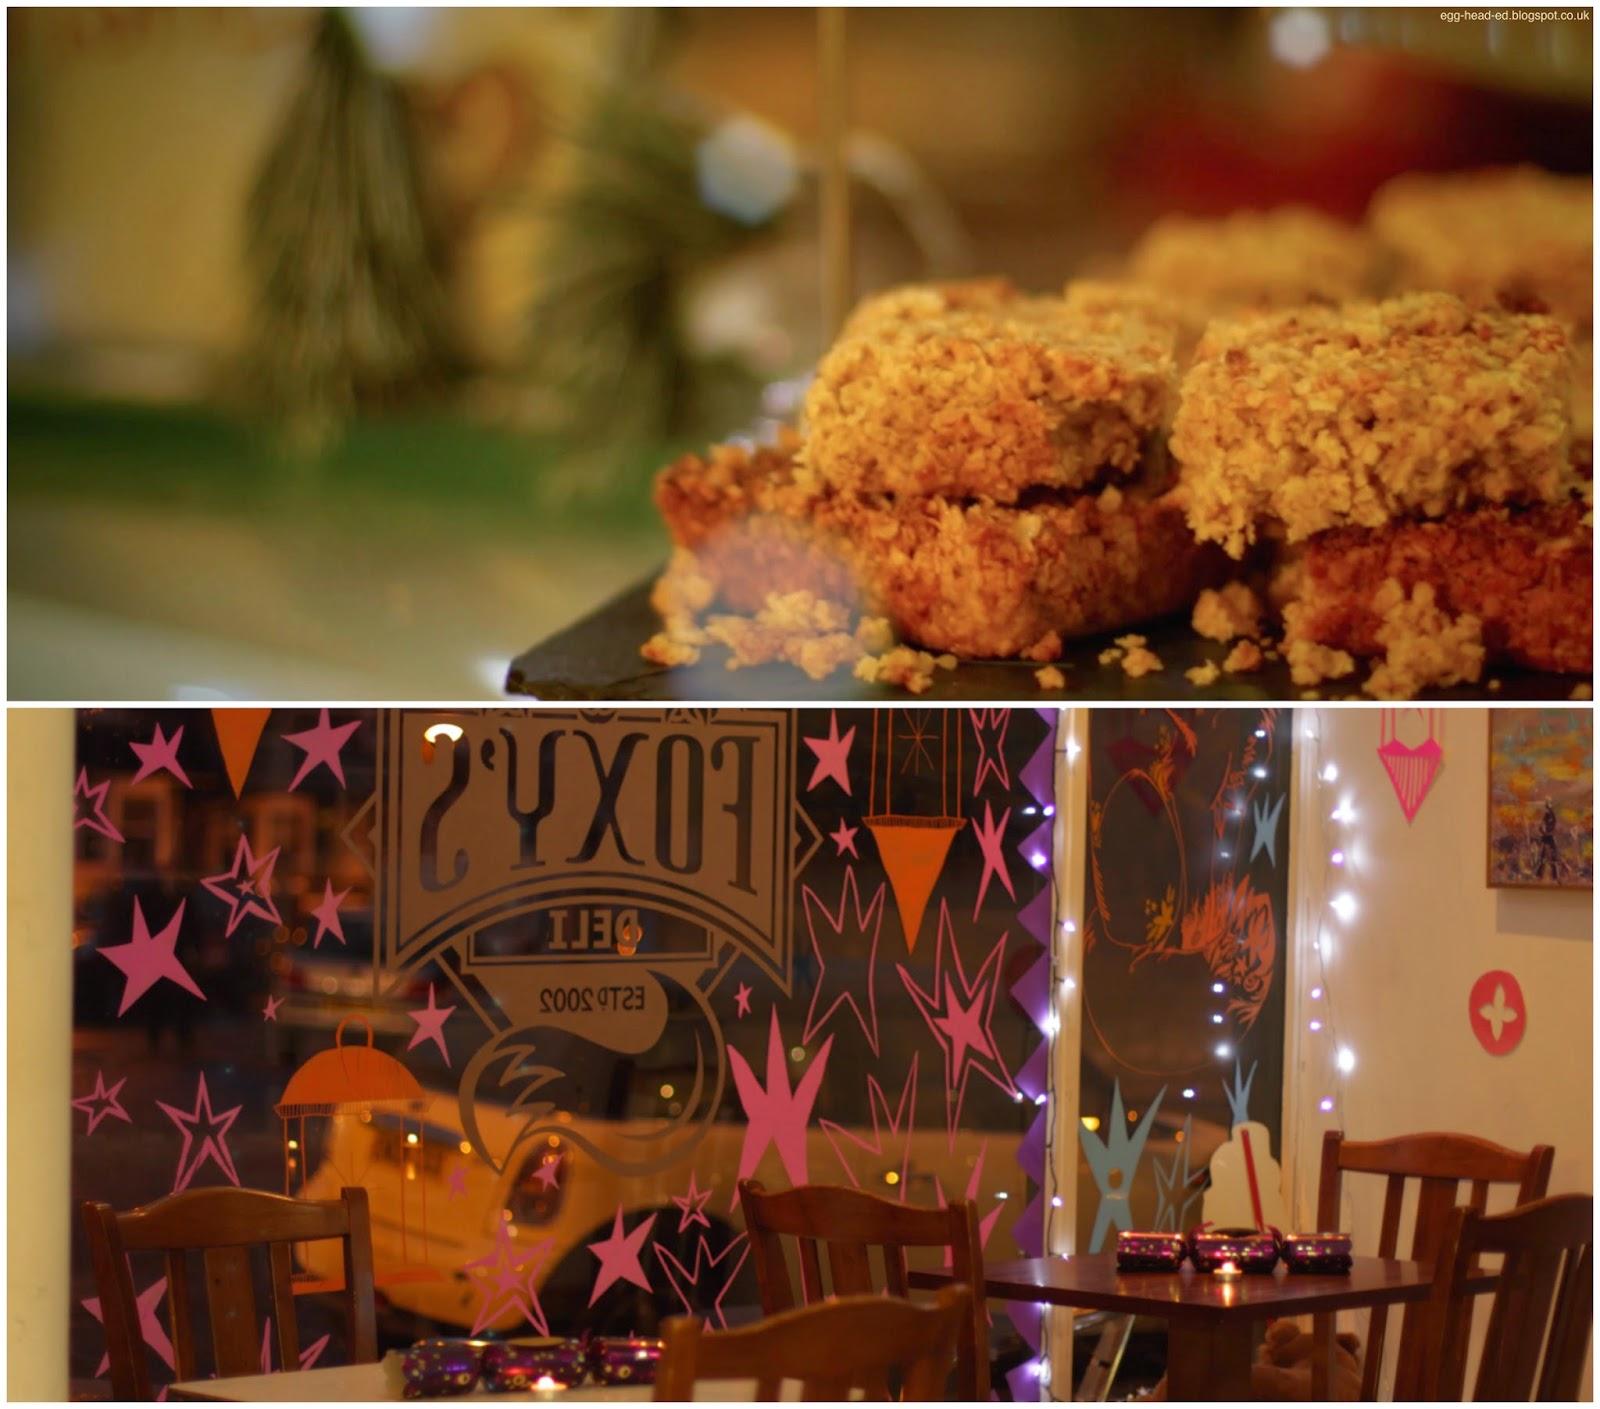 Foxy's Deli & Café Christmas Food